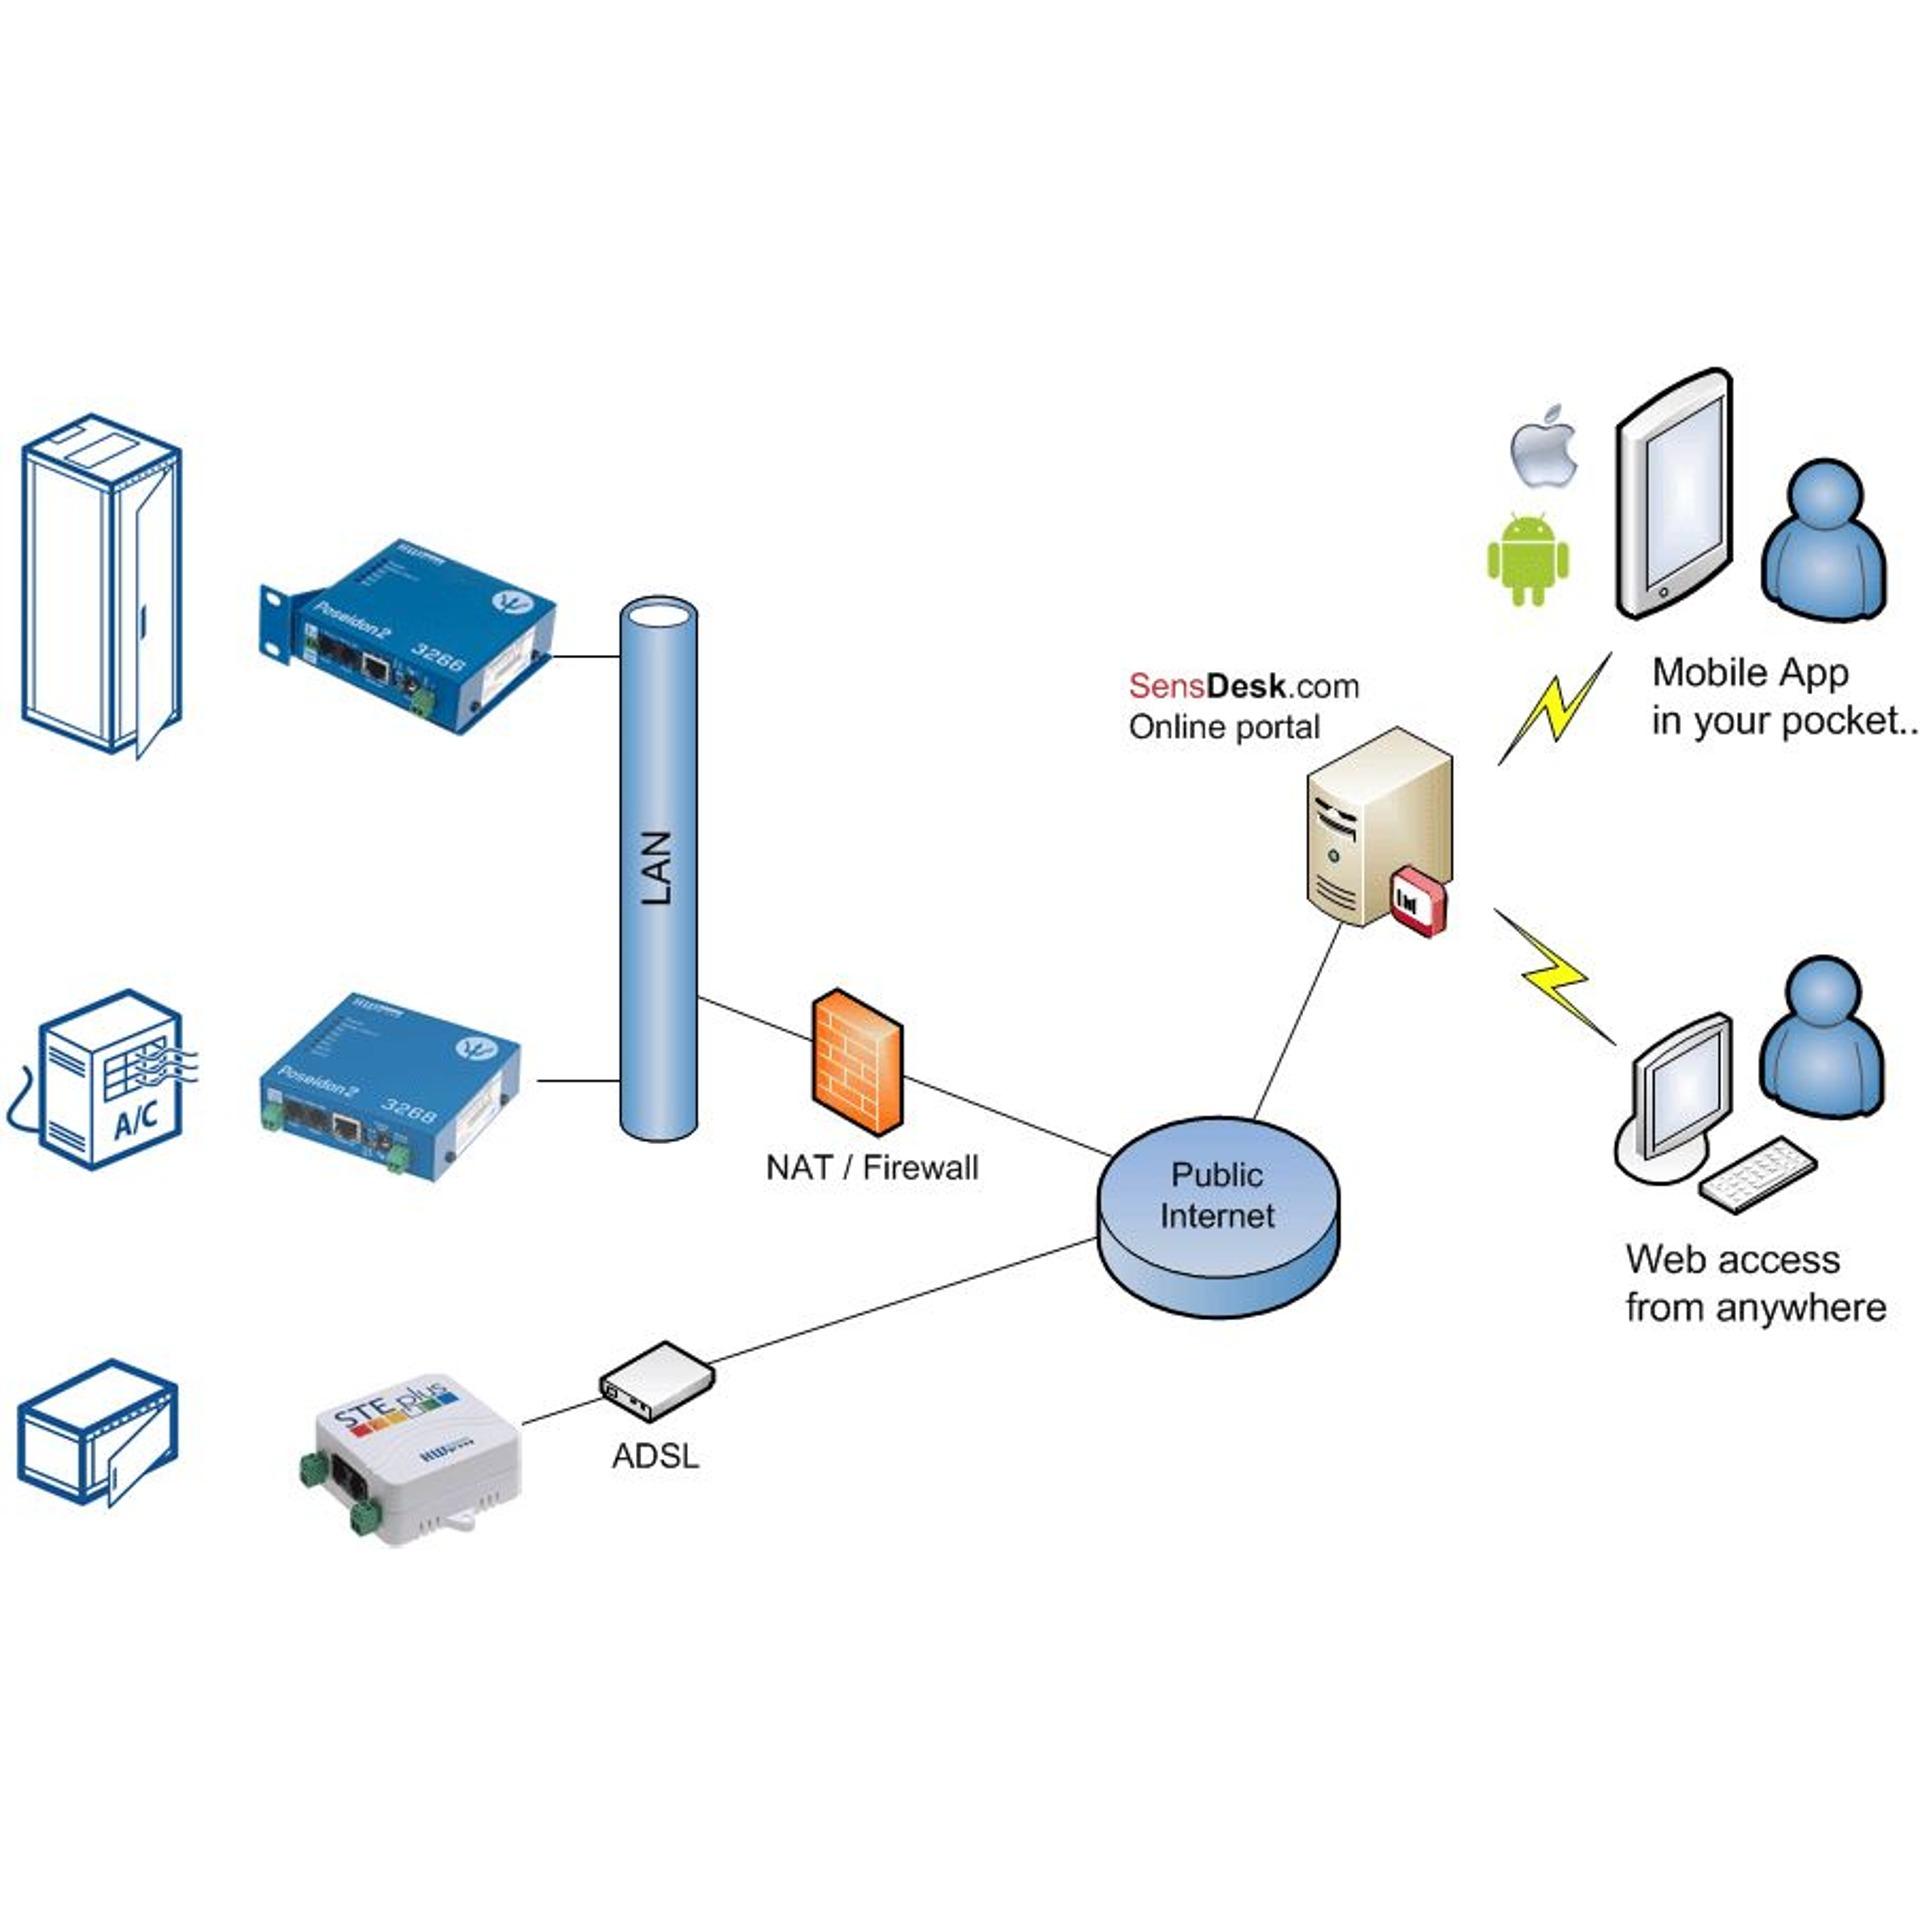 SensDesk.com - Online Portal von HW group - BellEquip